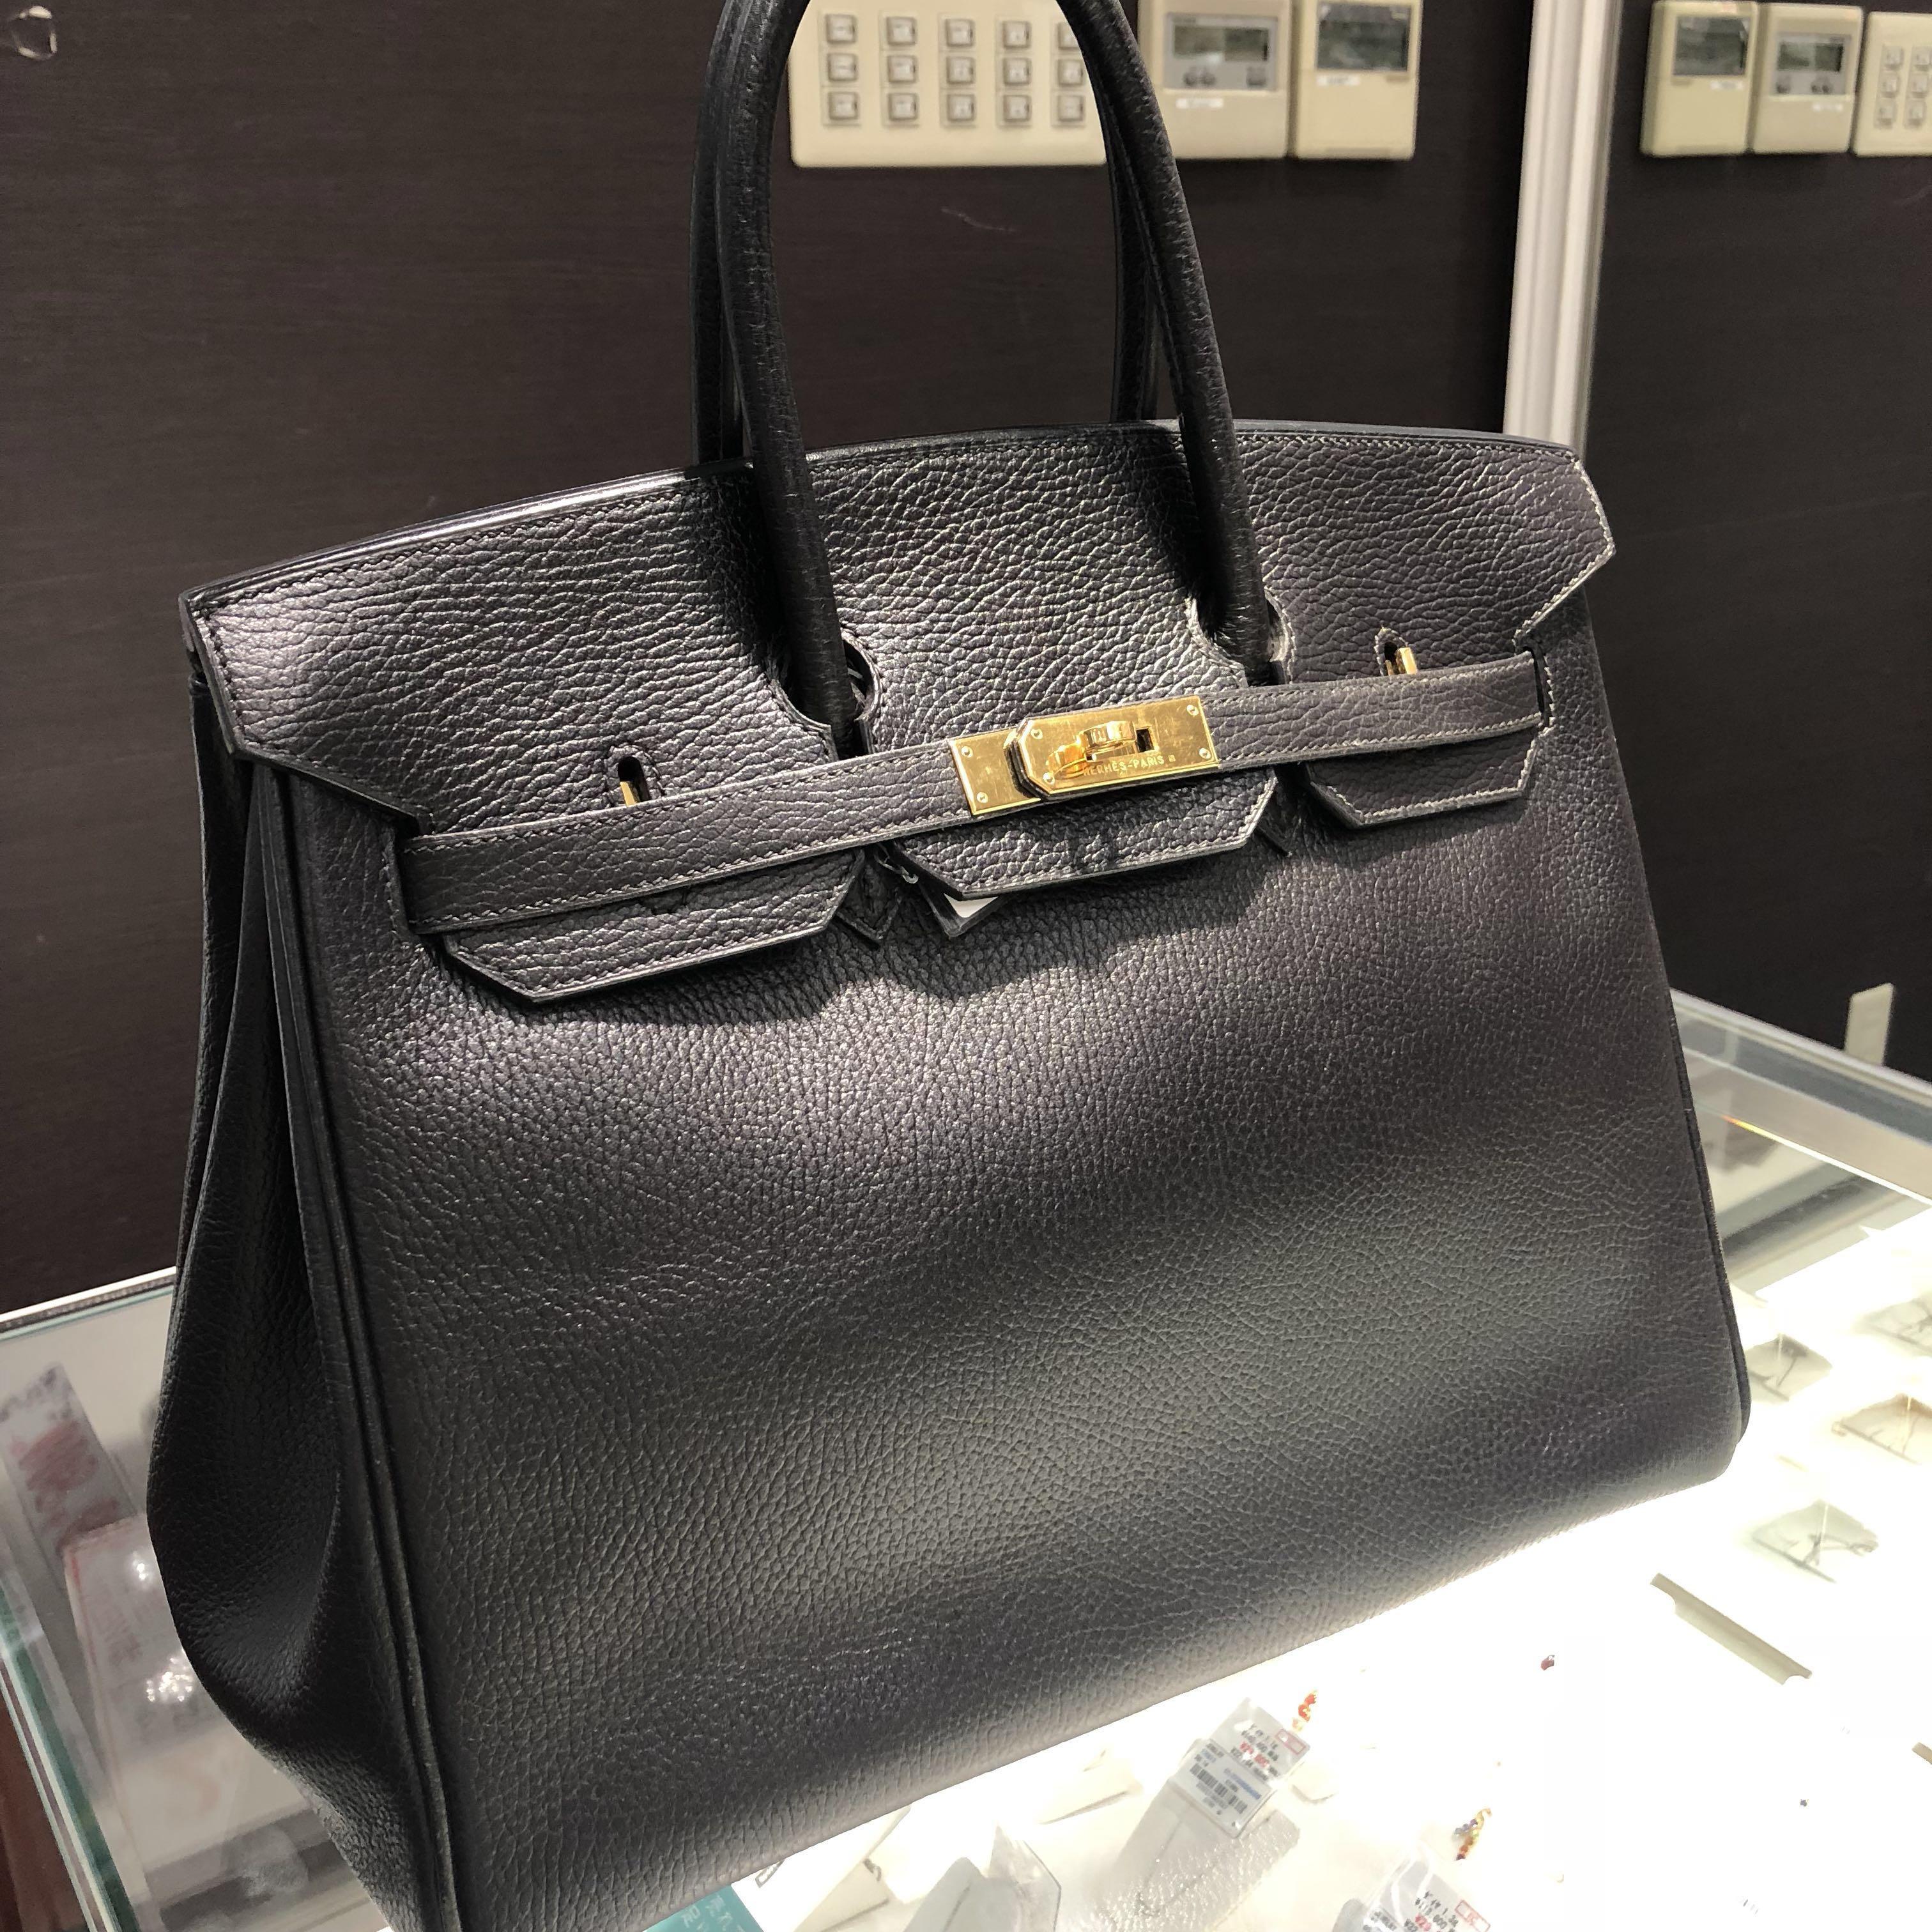 NOW IN JAPAN  Authentic Hermes 35 Birkin Epsom Leather (not box calf ... f1c33f7cbe8fb